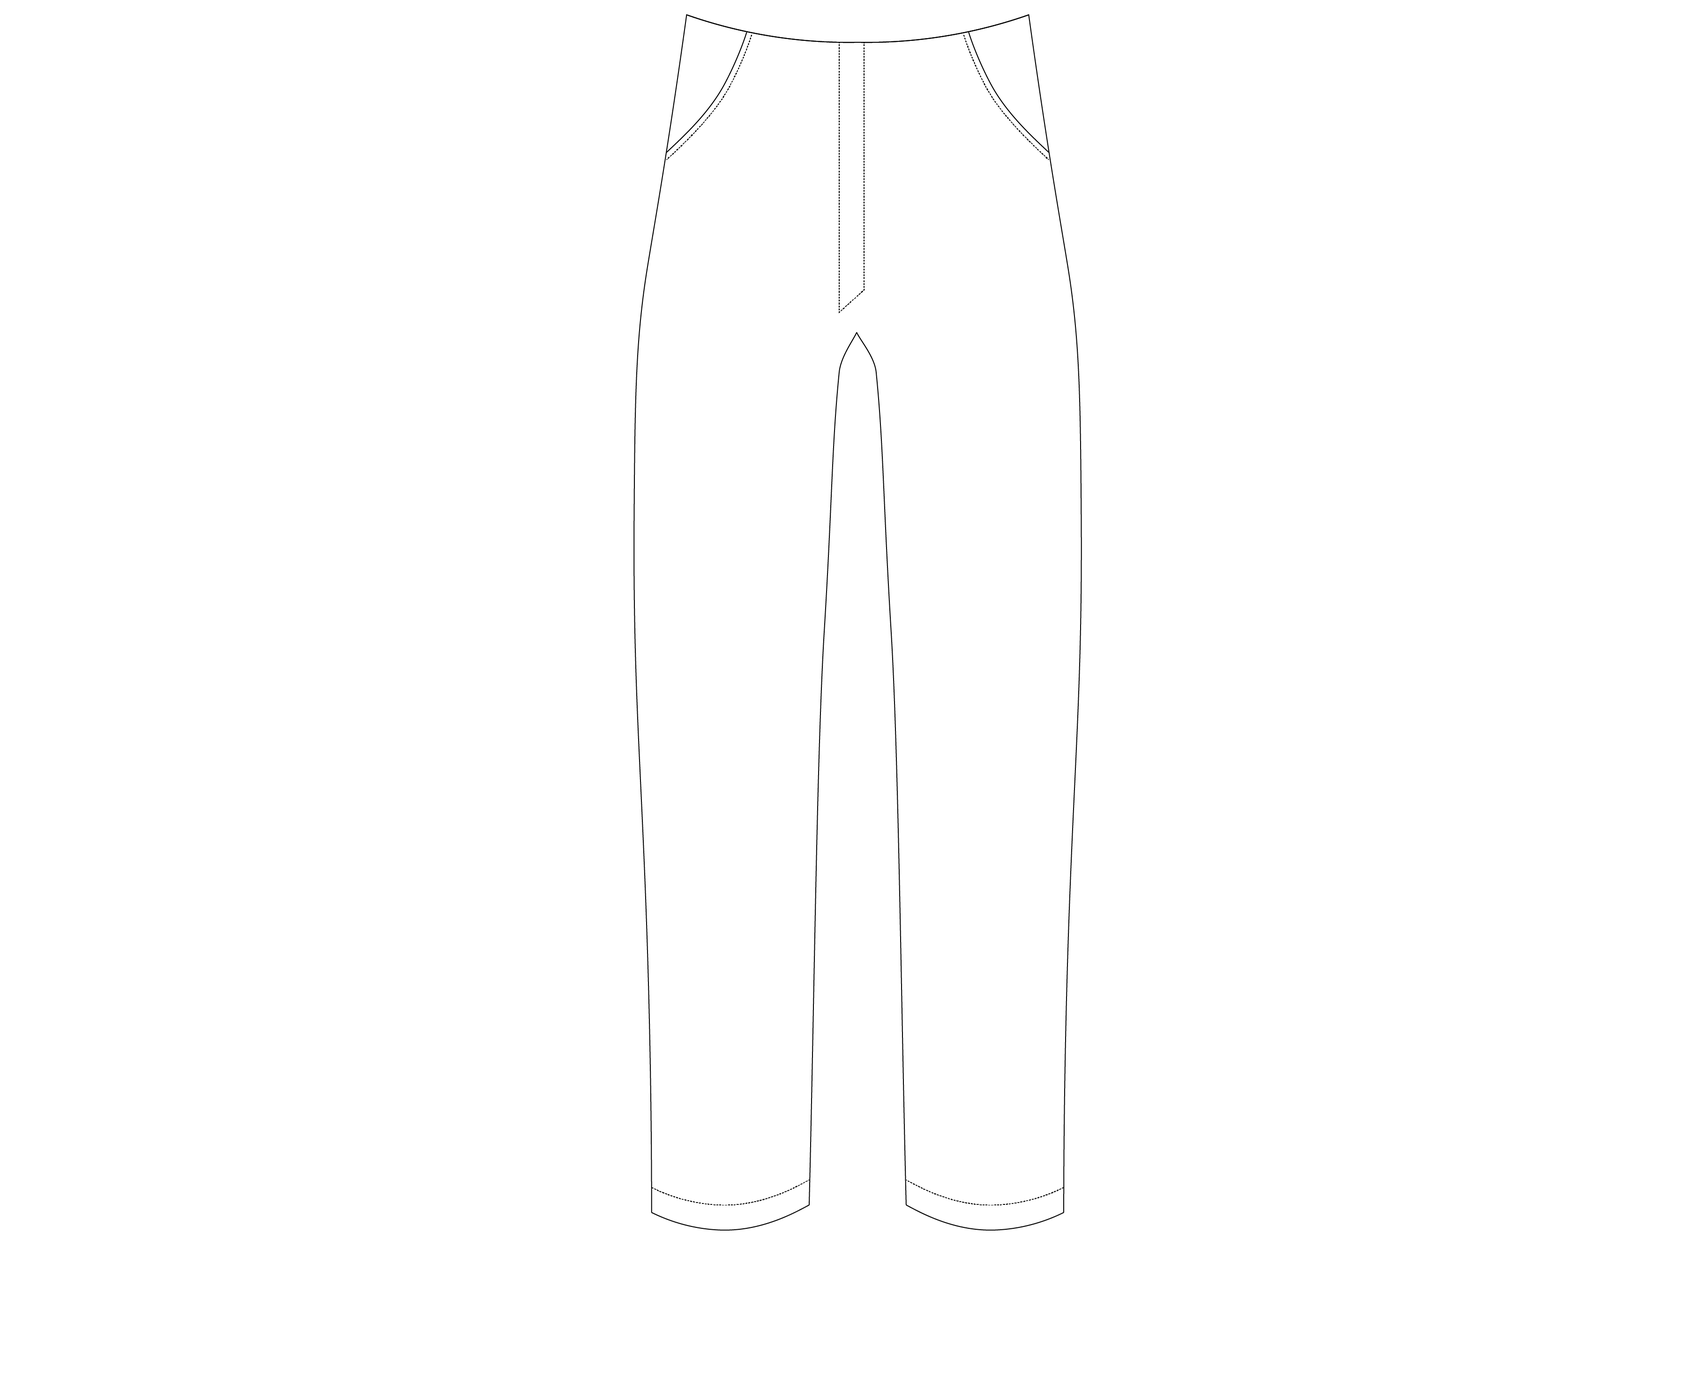 UNC design templates-02.png